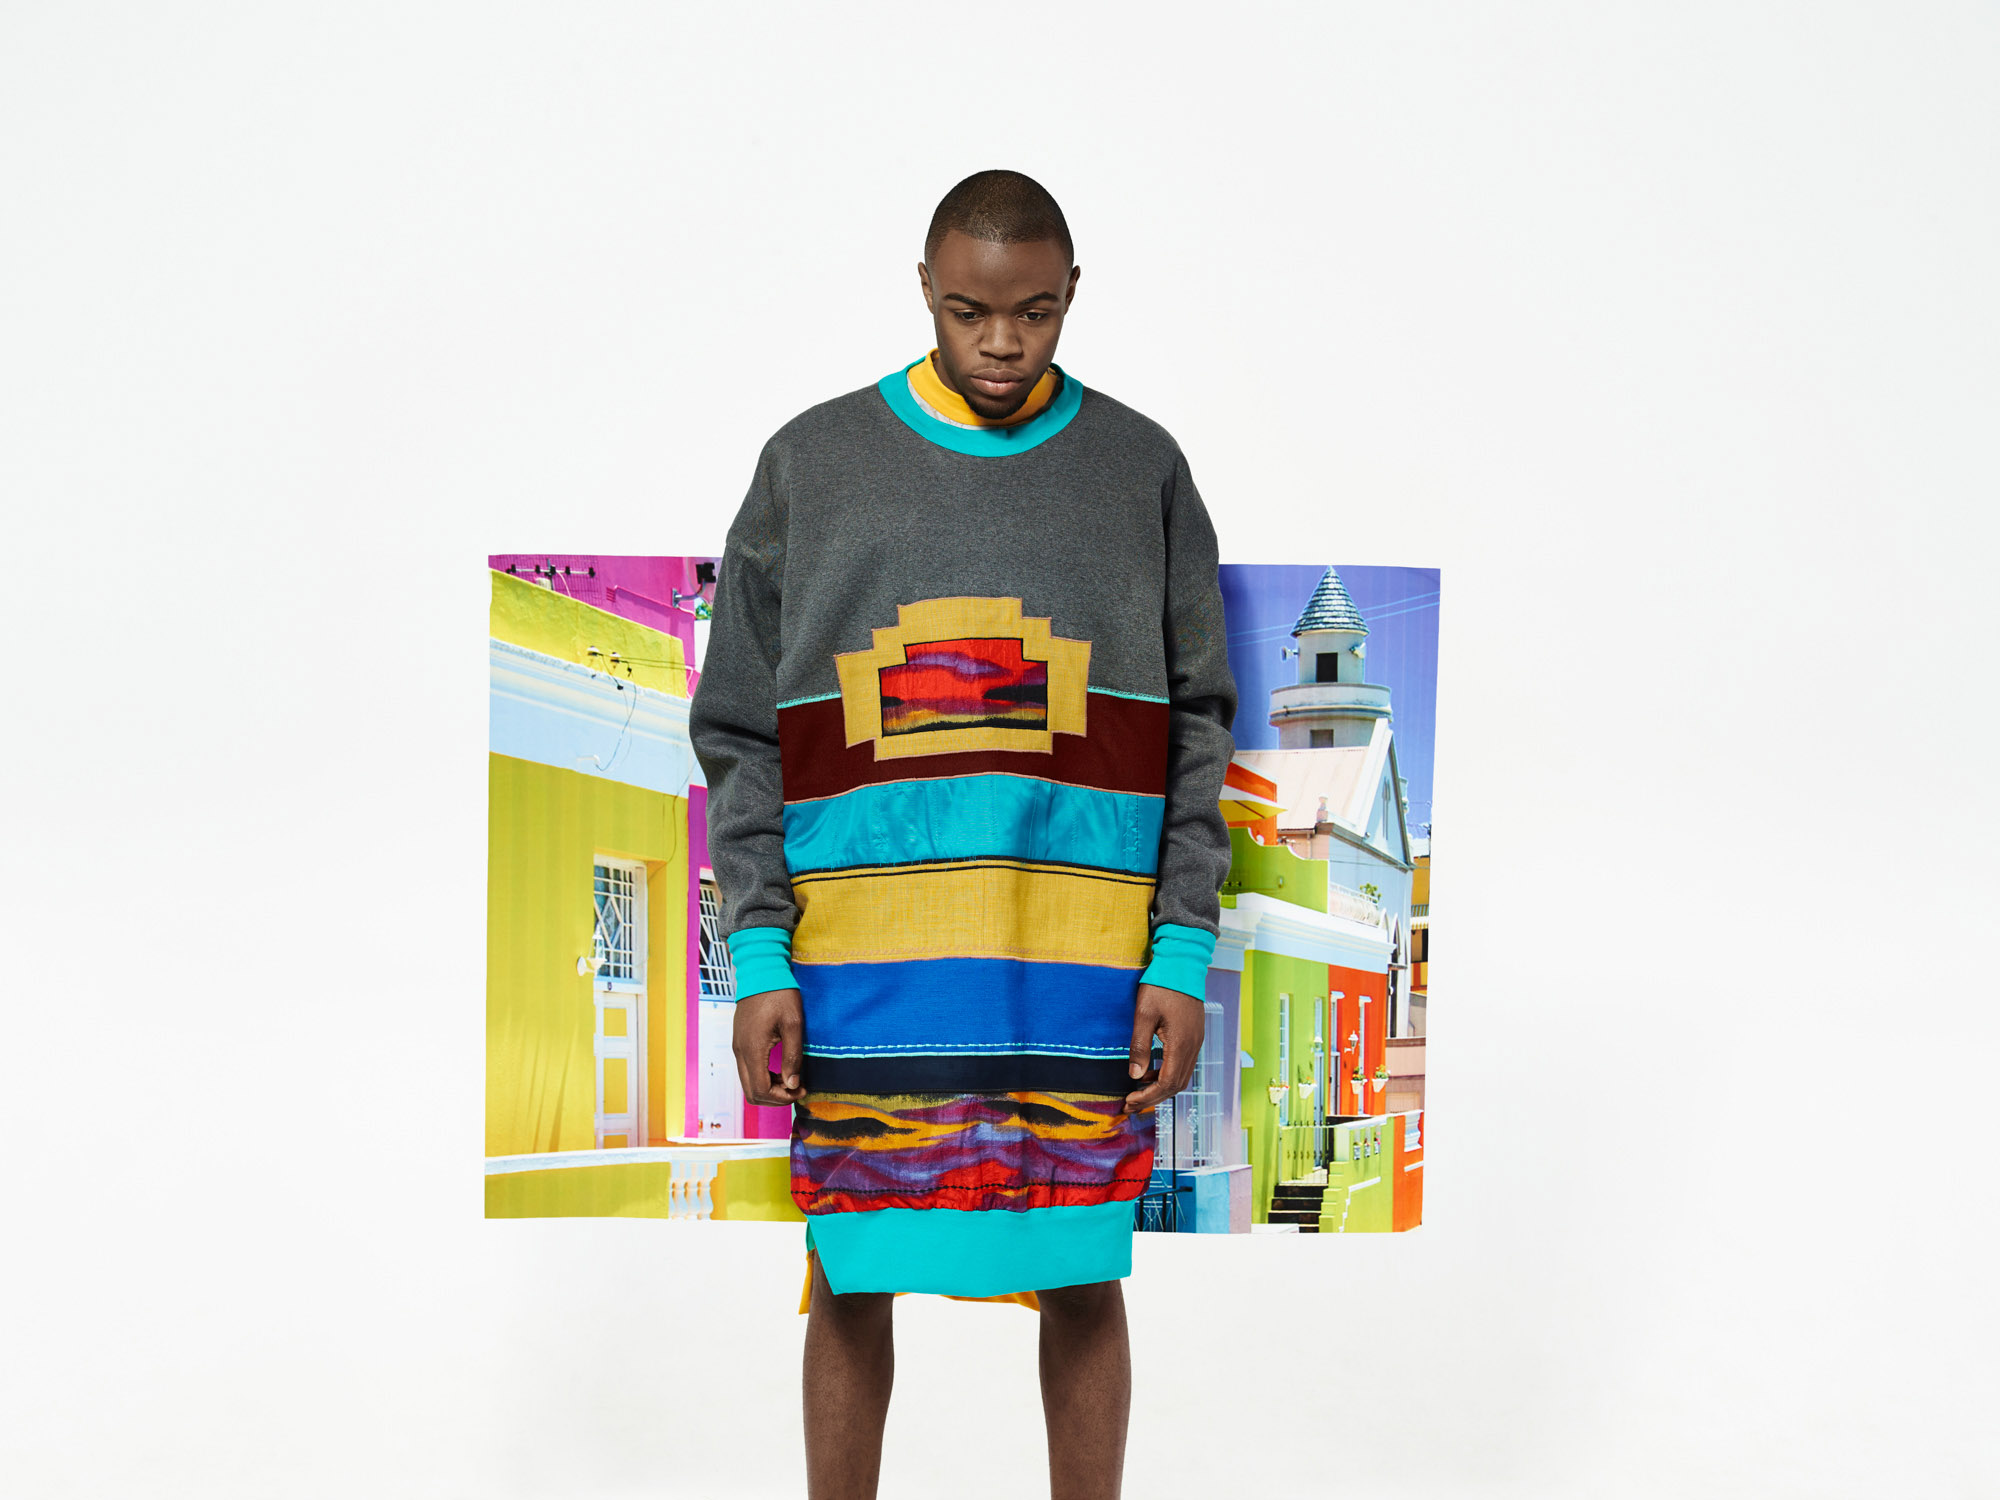 fashion Malay Quarter häusermode bo-kaap südafrika bild im bild bgrafisch bunt setbau